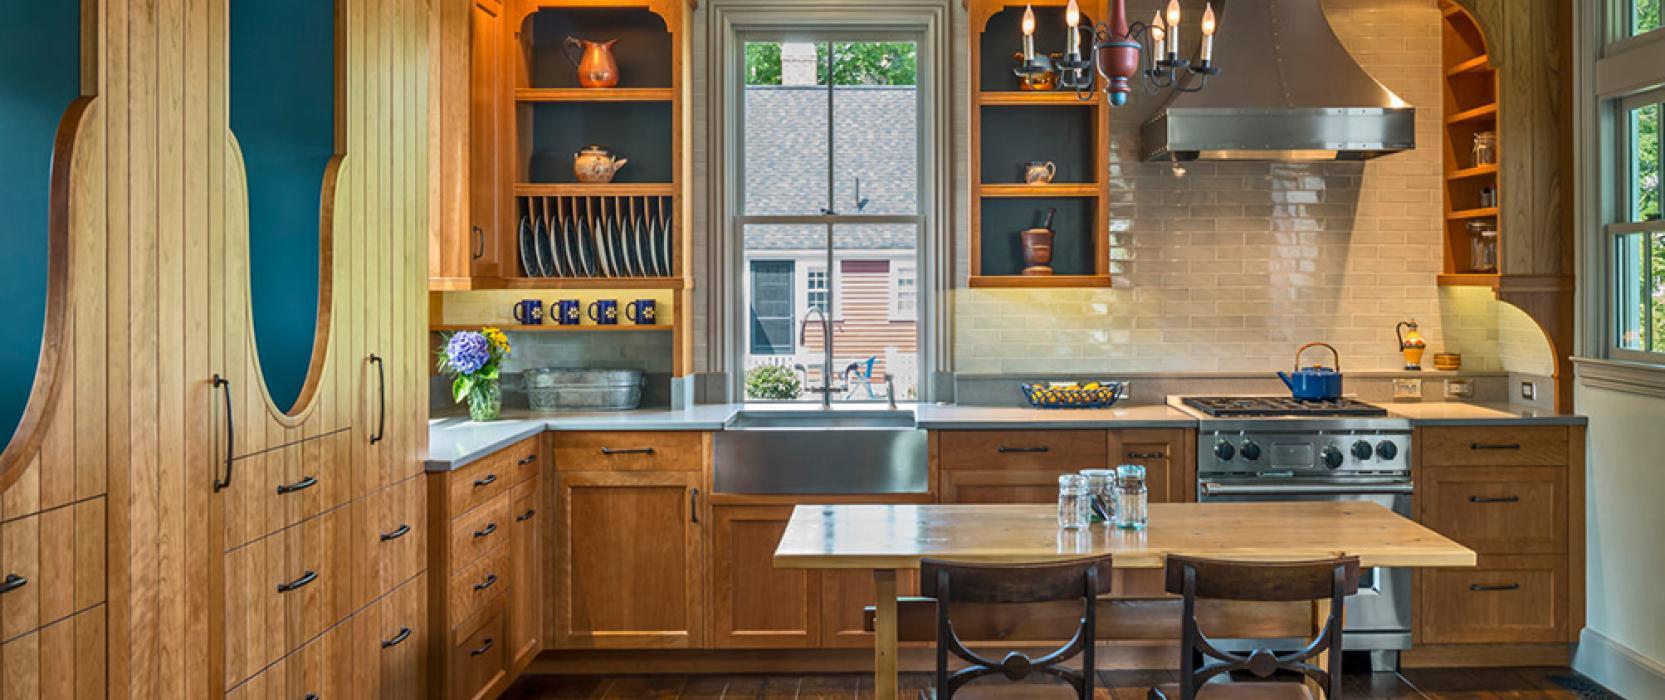 Kitchen Design sudbury ma